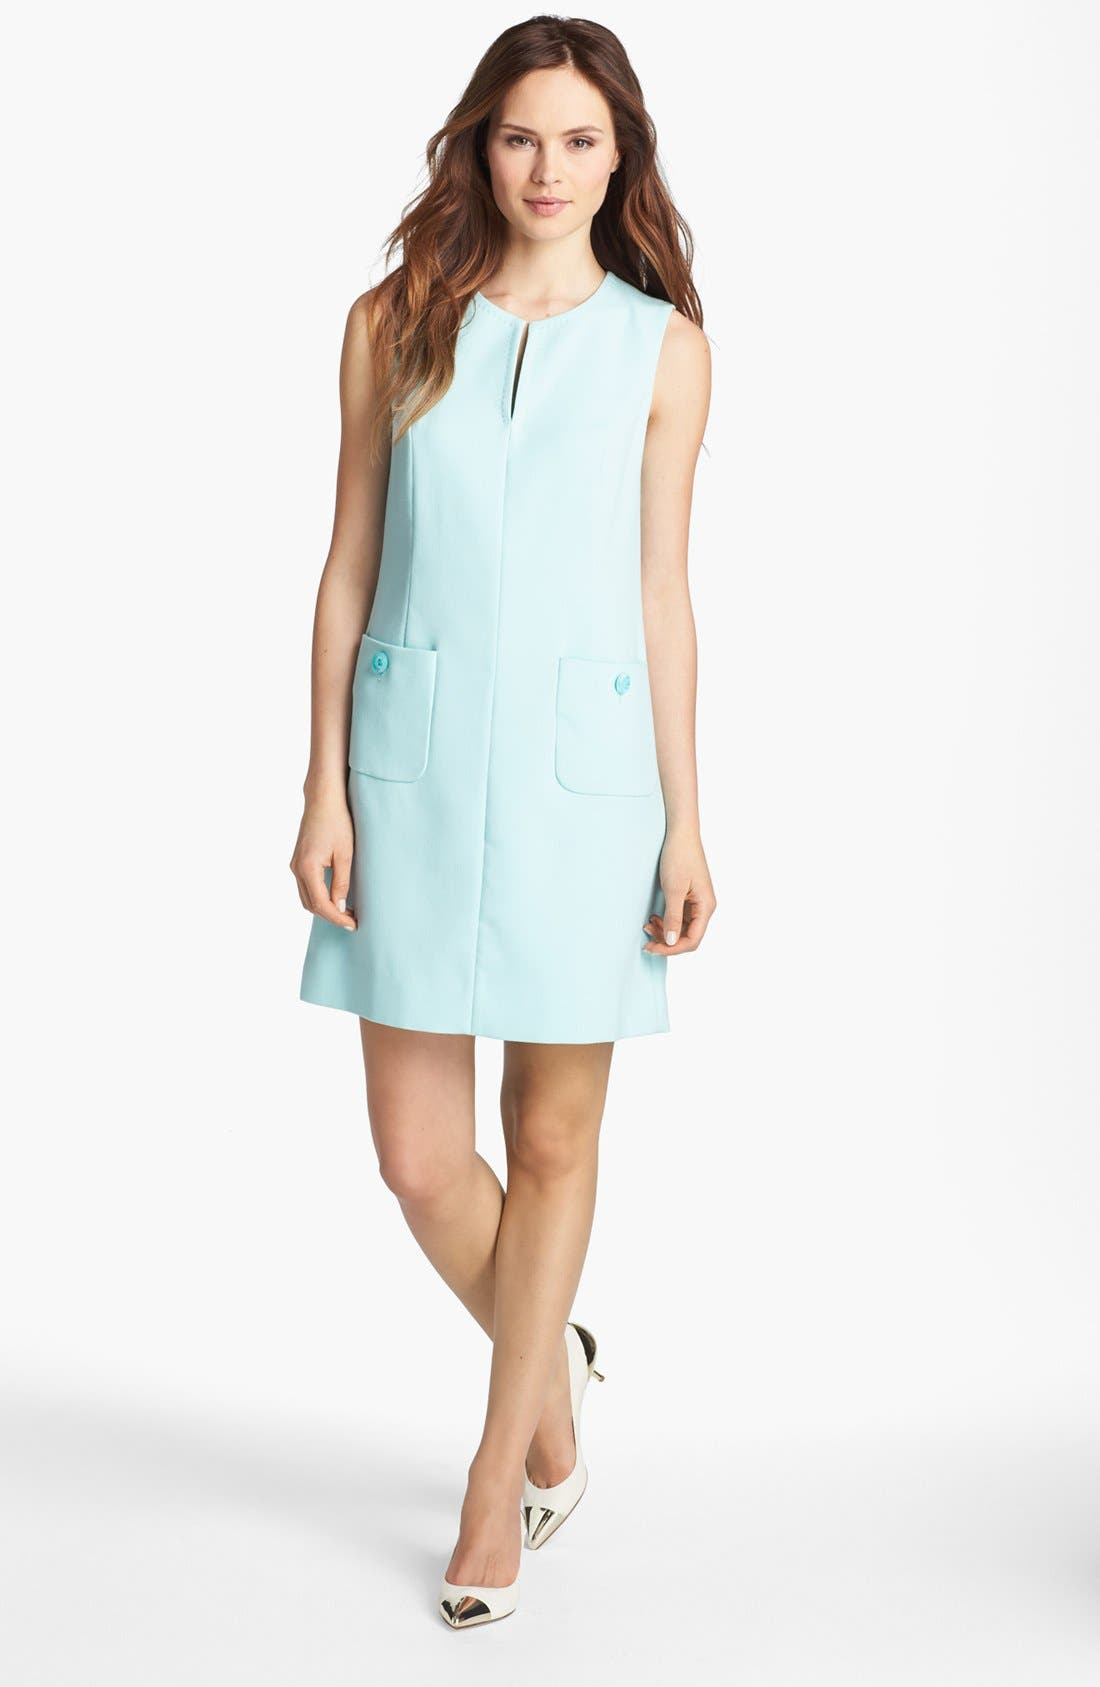 Alternate Image 1 Selected - kate spade new york 'tali' crepe shift dress